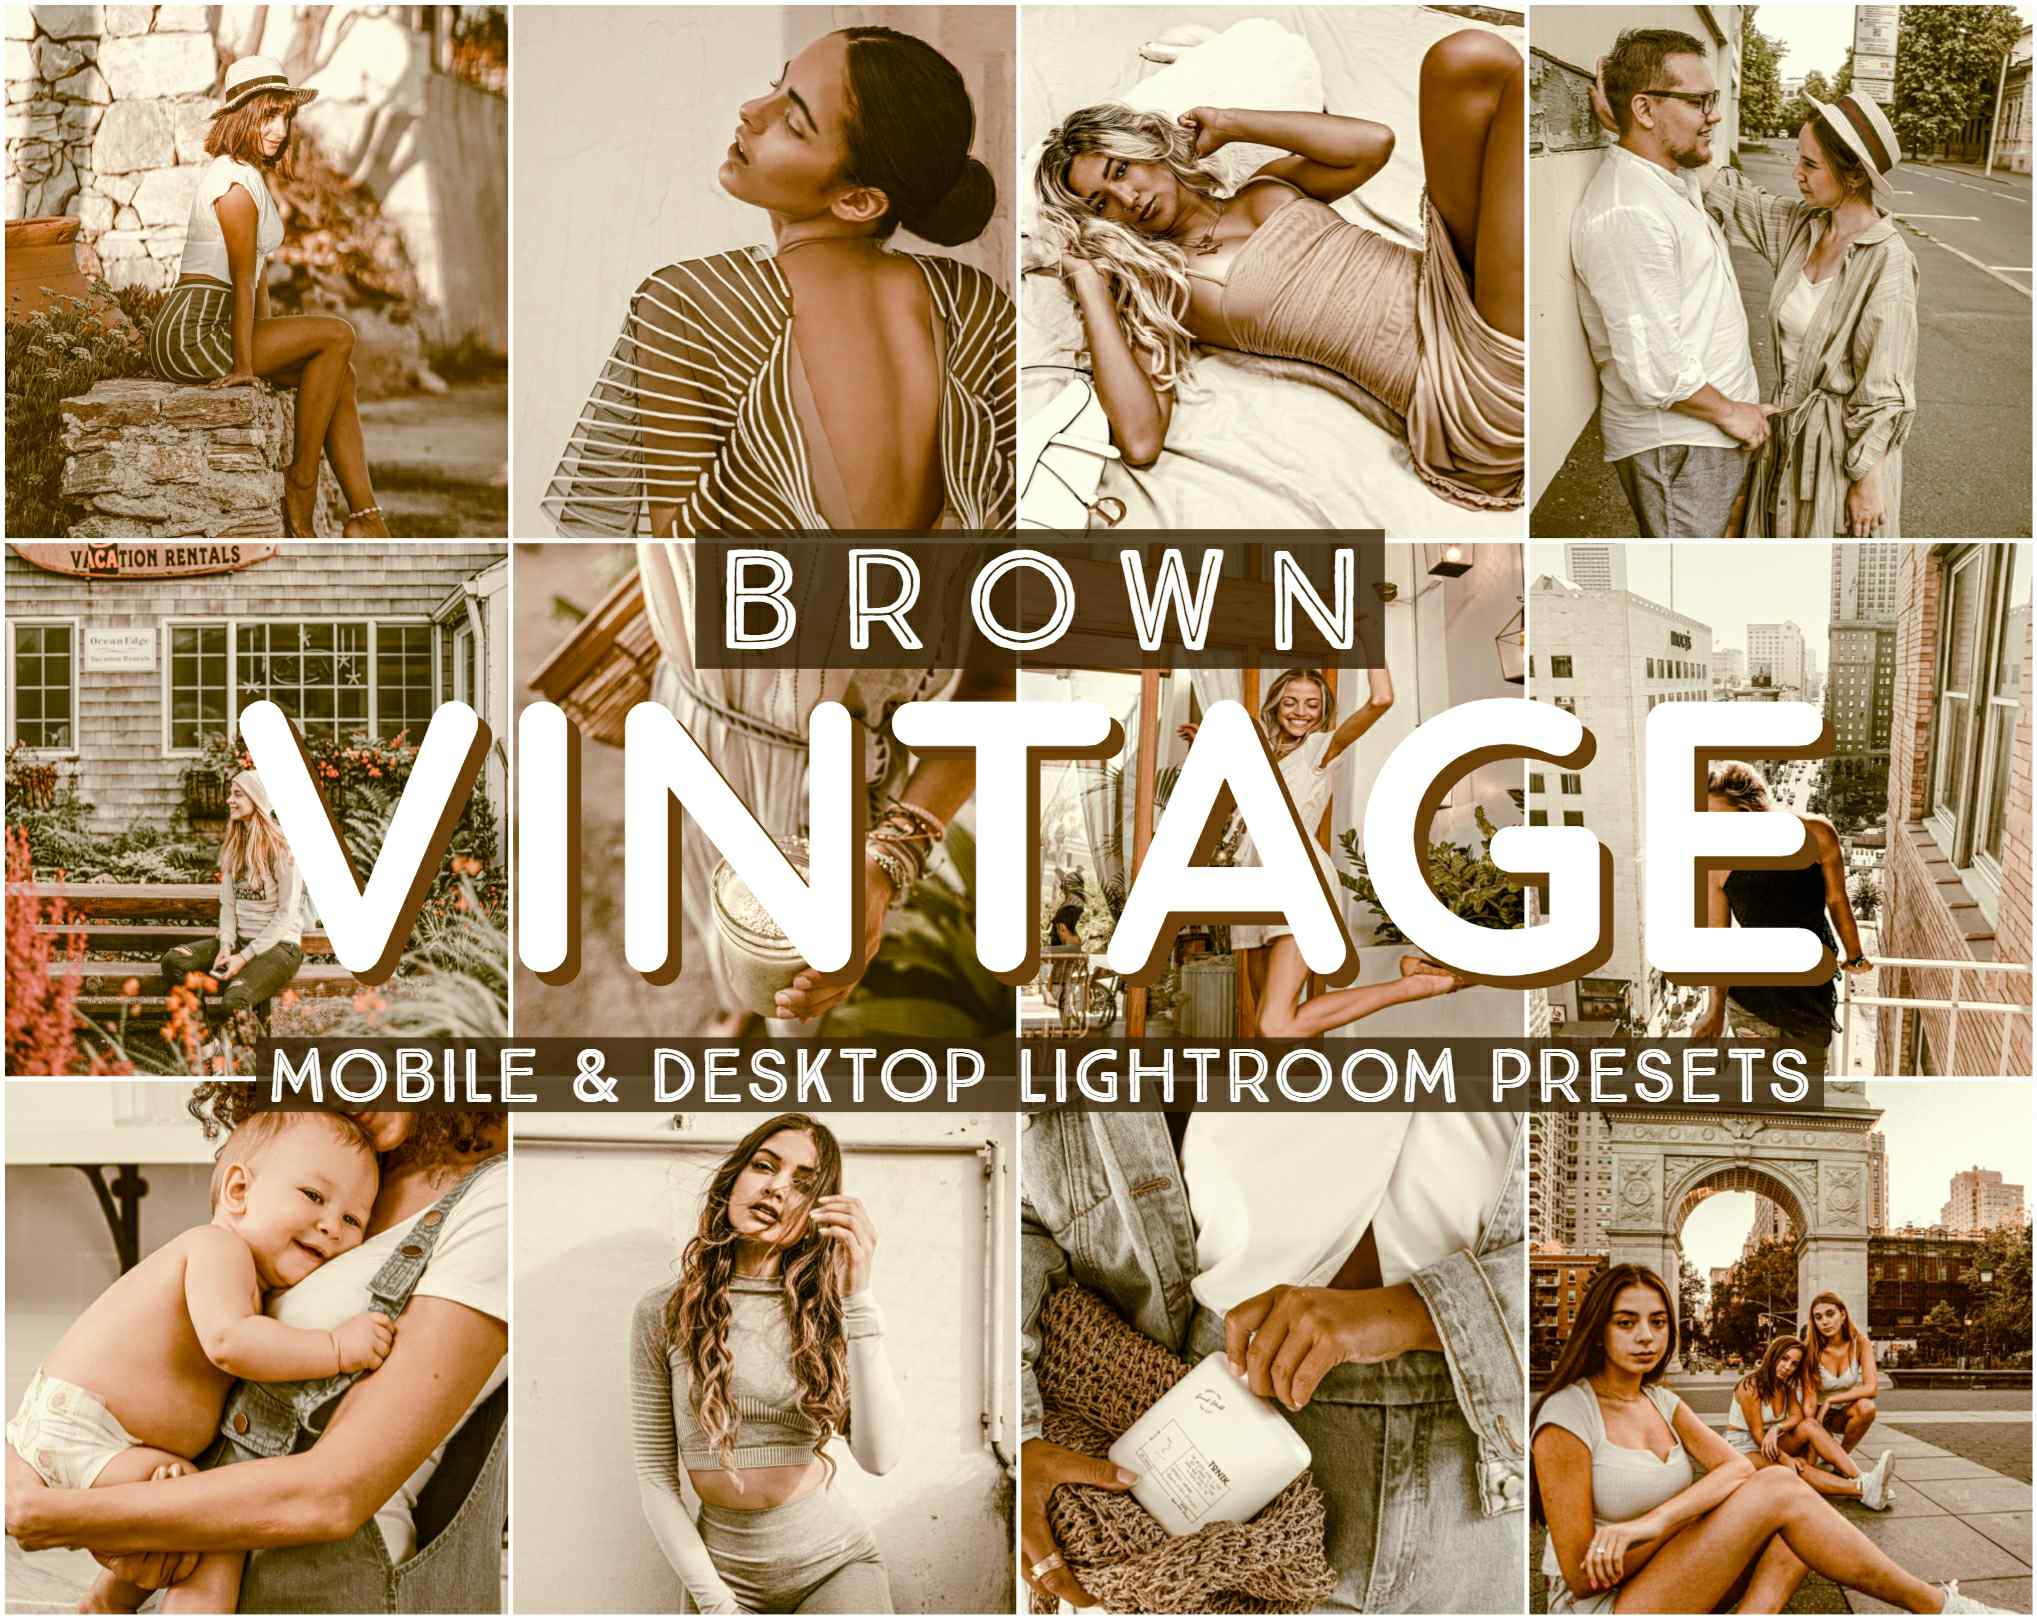 Lightroom Preset Mobile Brown Preset Instagram Preset Preset Lightroom mobile /& desktop Autumn Preset Fall Preset Lightroom Preset